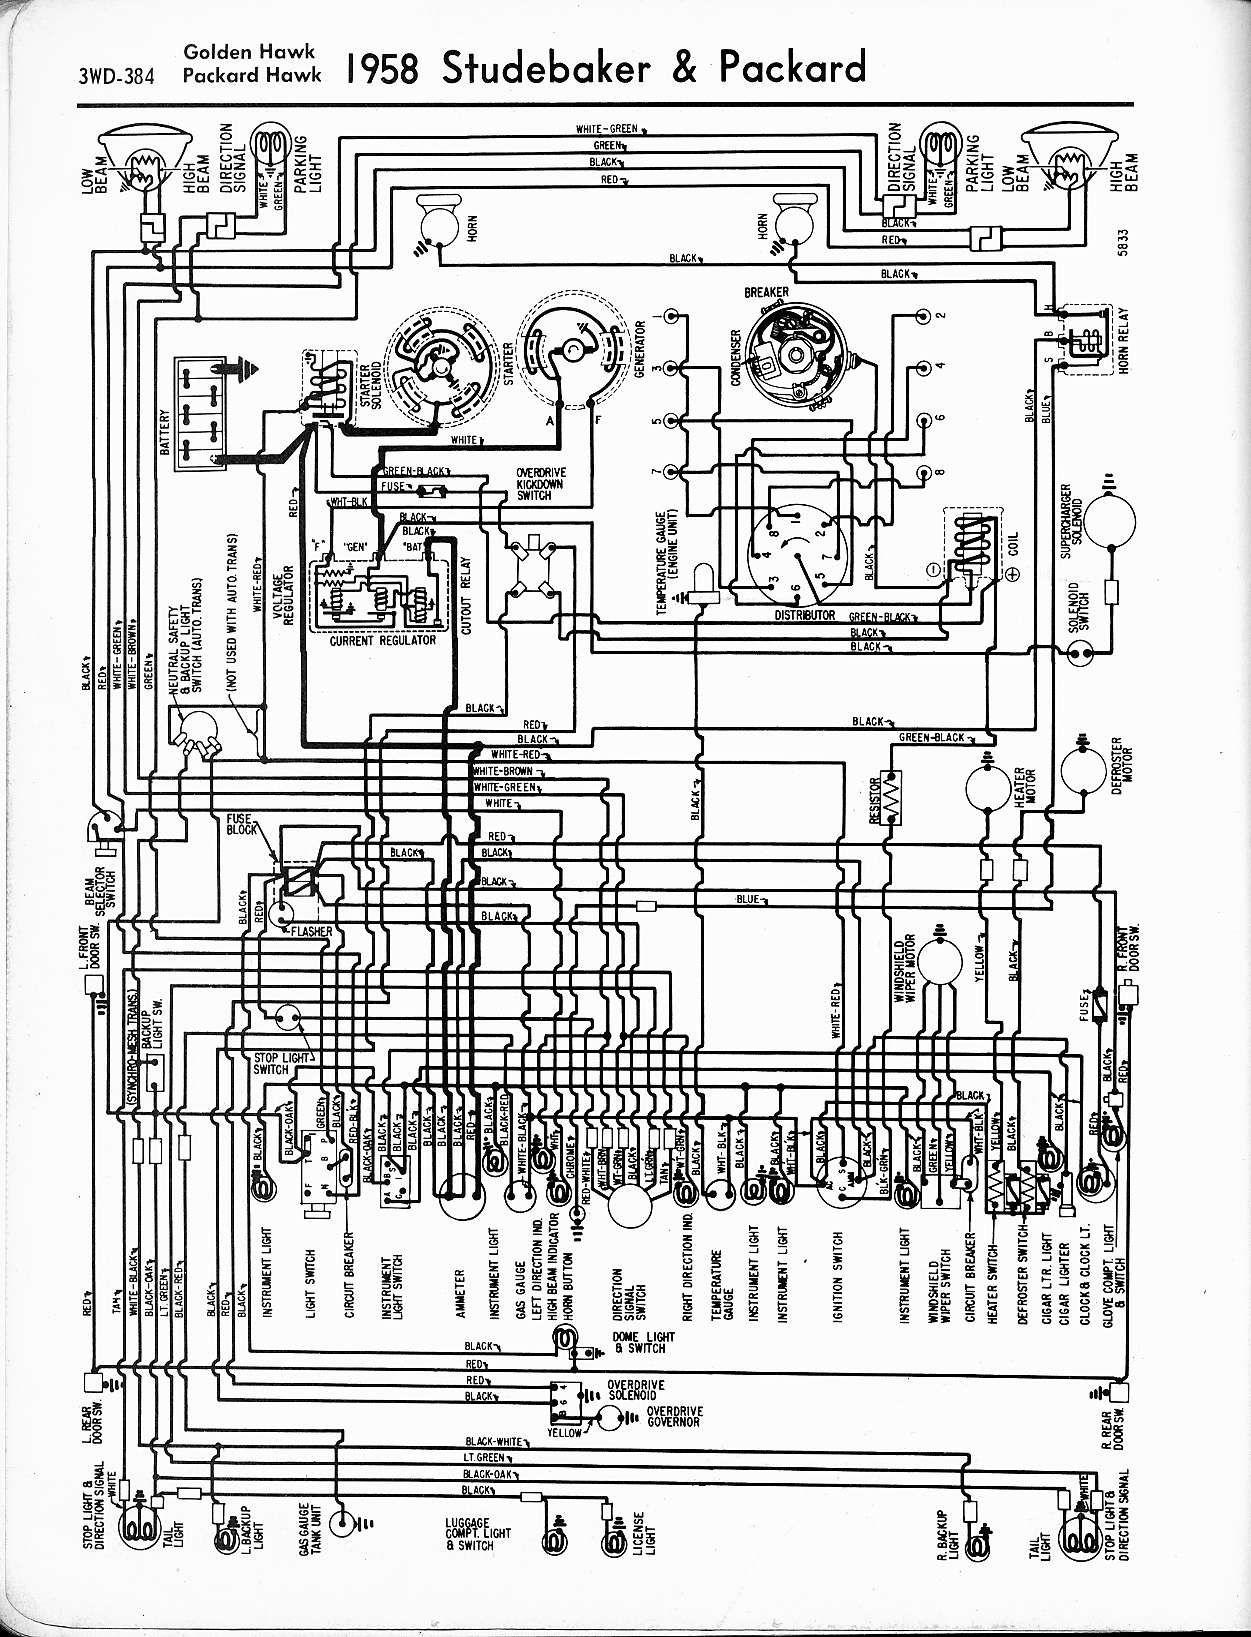 Image Result For Studebaker Technical Drawings Diagram Design Diagram Trailer Wiring Diagram